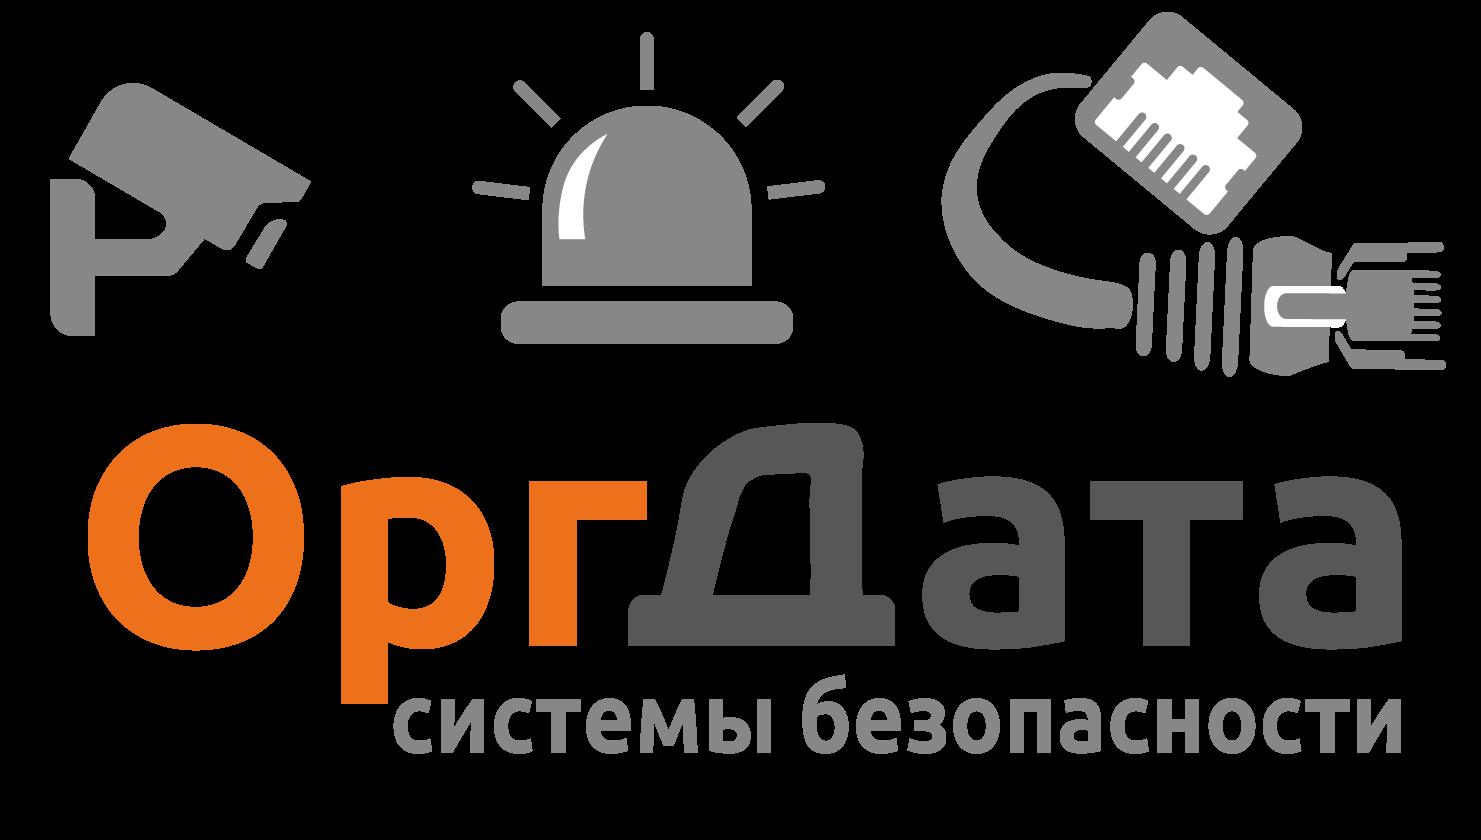 Логотип для информационного агентства фото f_9935aa24b74523dc.png